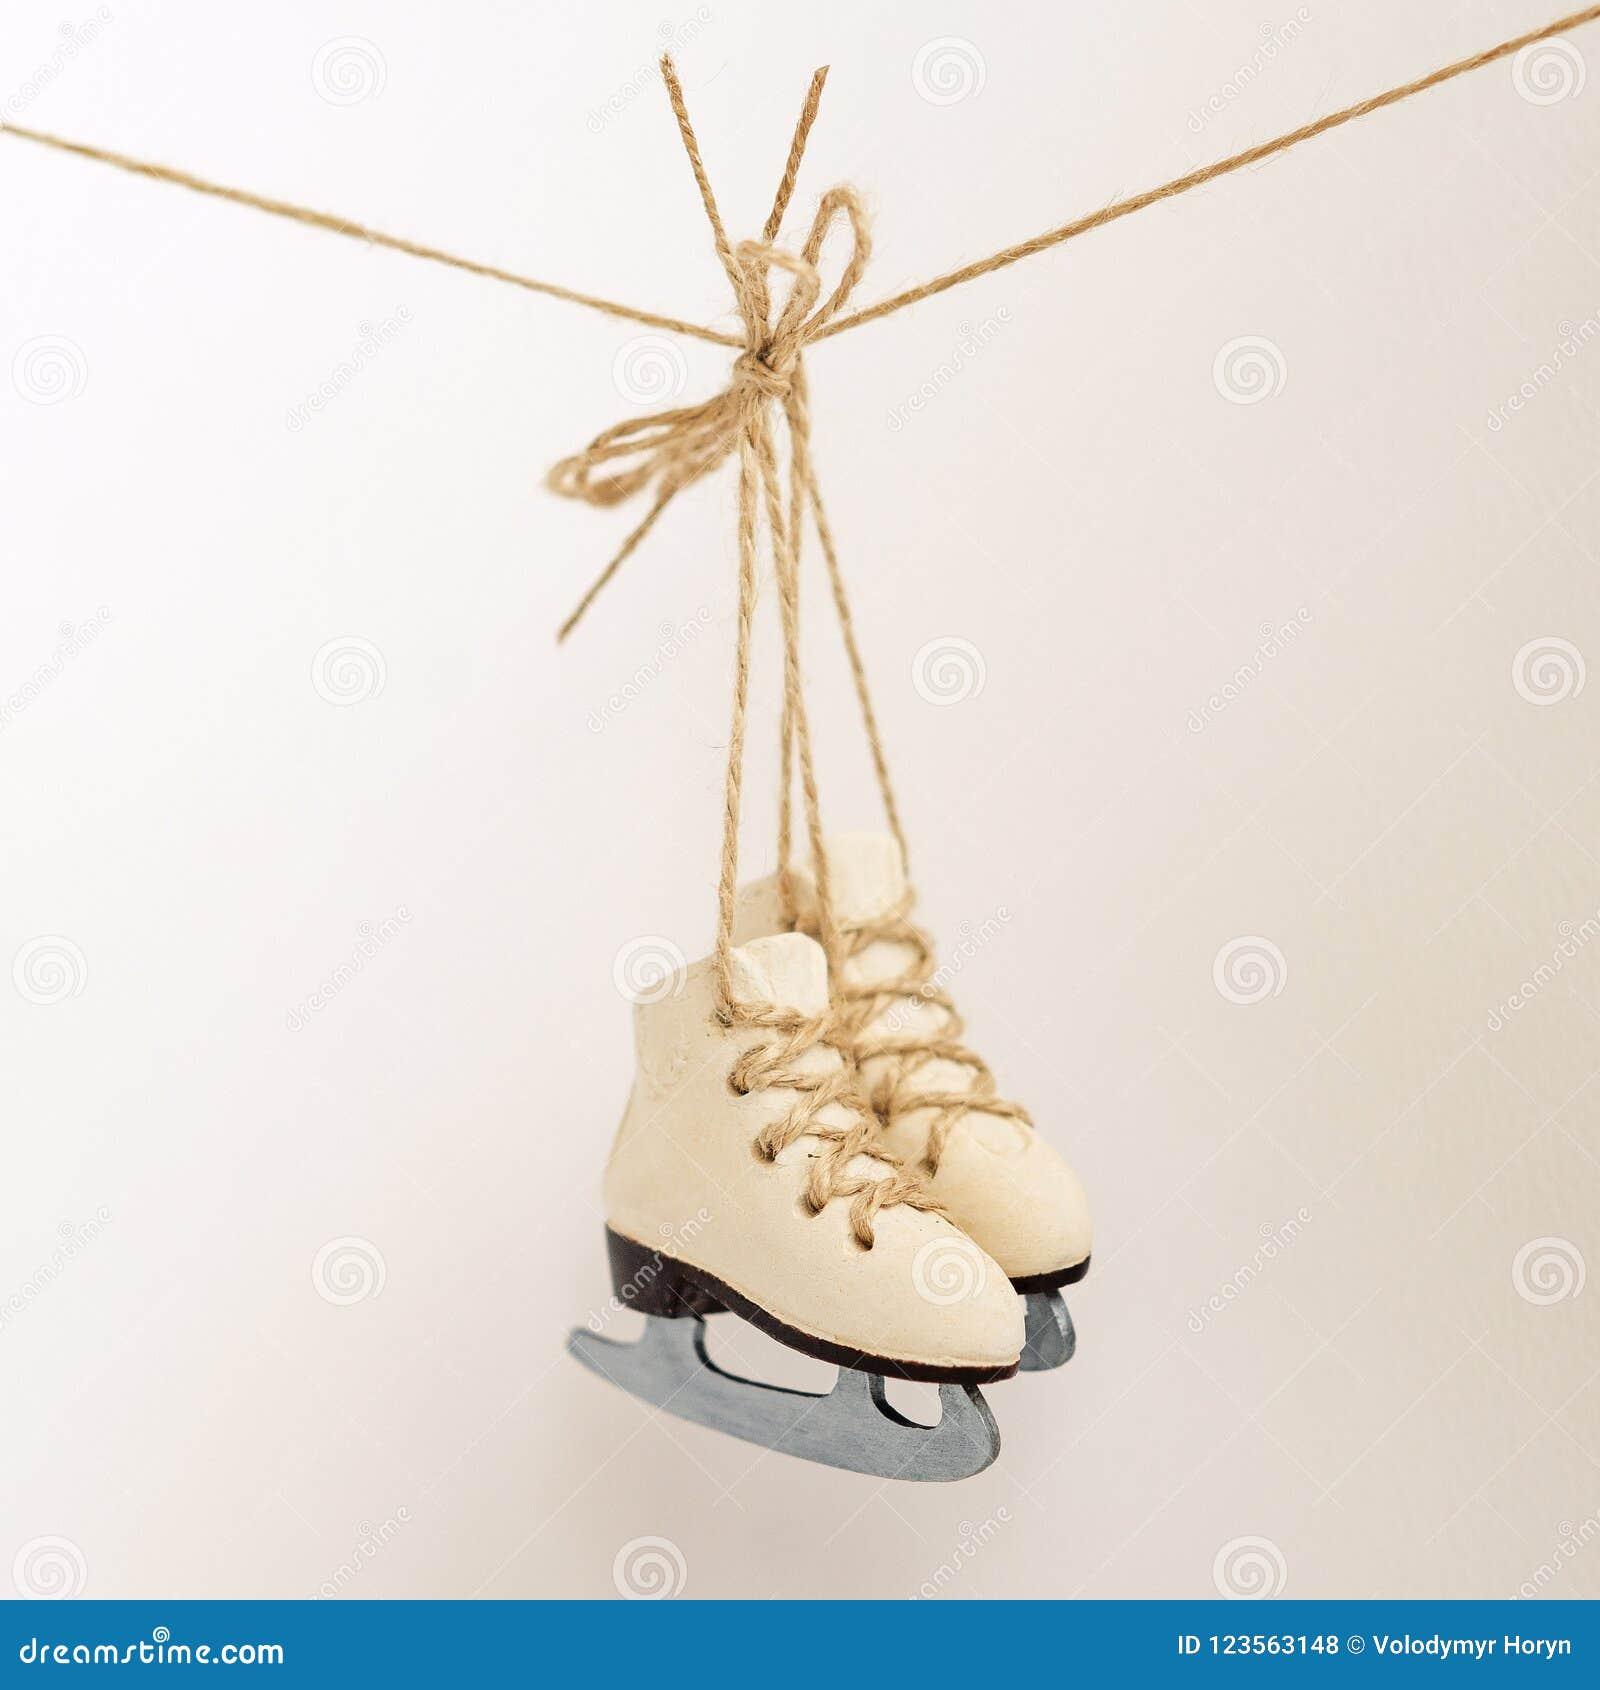 Сhristmas Tree Decoration Small Ice Skates On The Rope Stock Photo ...